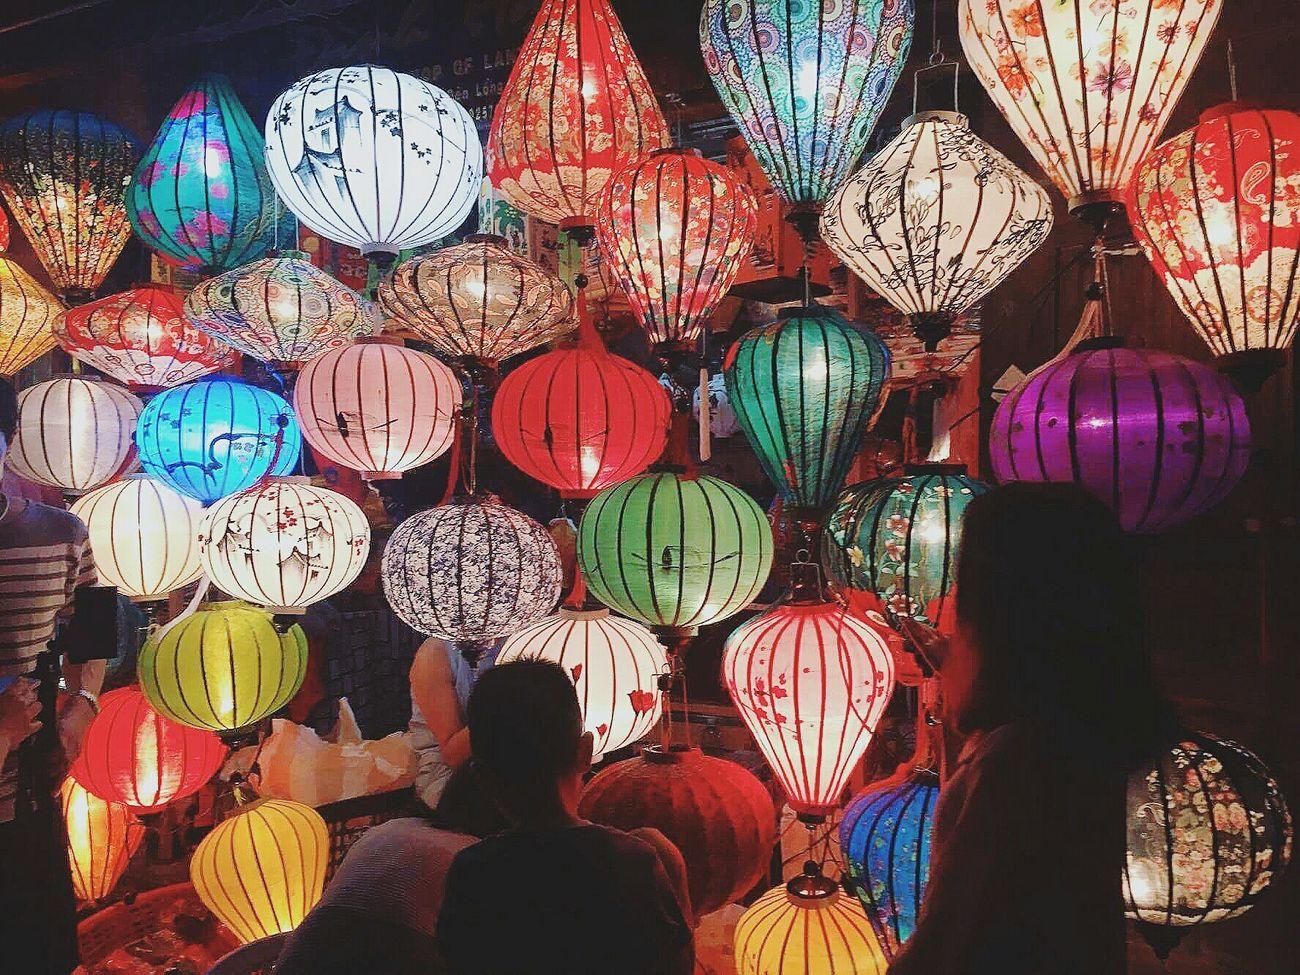 First Eyeem Photo HoiAnancienttown Hoianancientown Photooftheday Vietnam Trip Colorful Lanterns